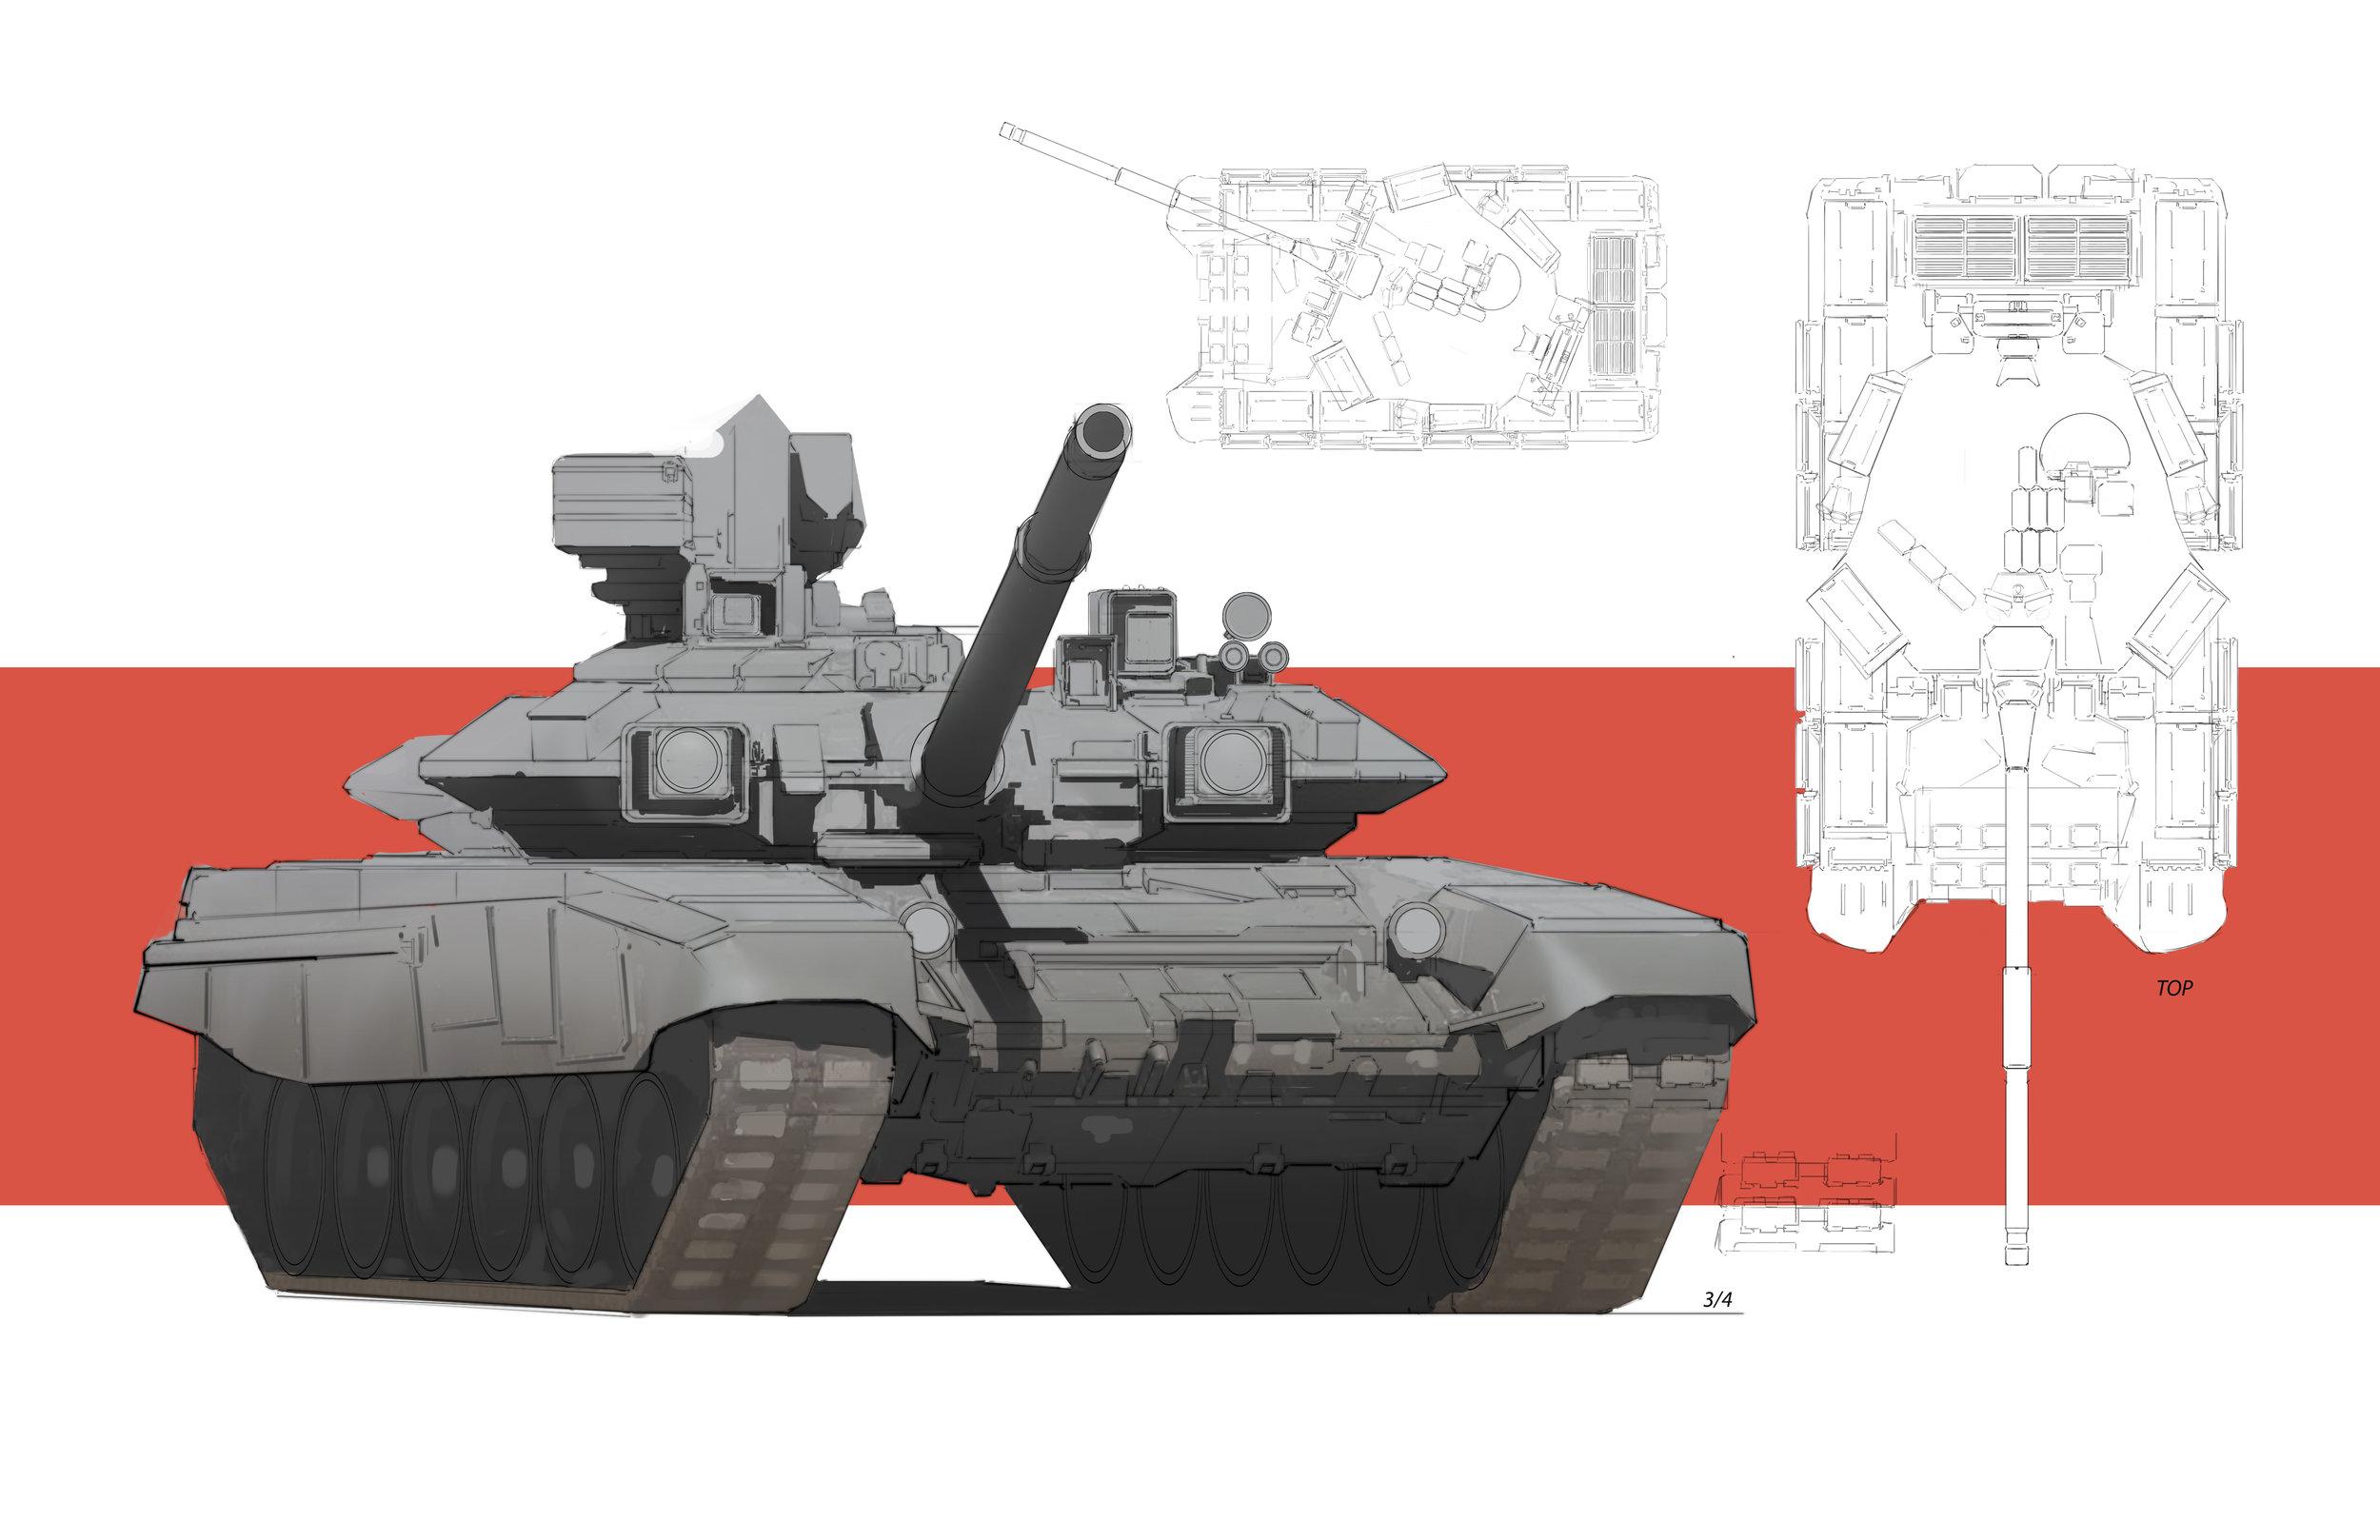 tank_exploration_01.jpg